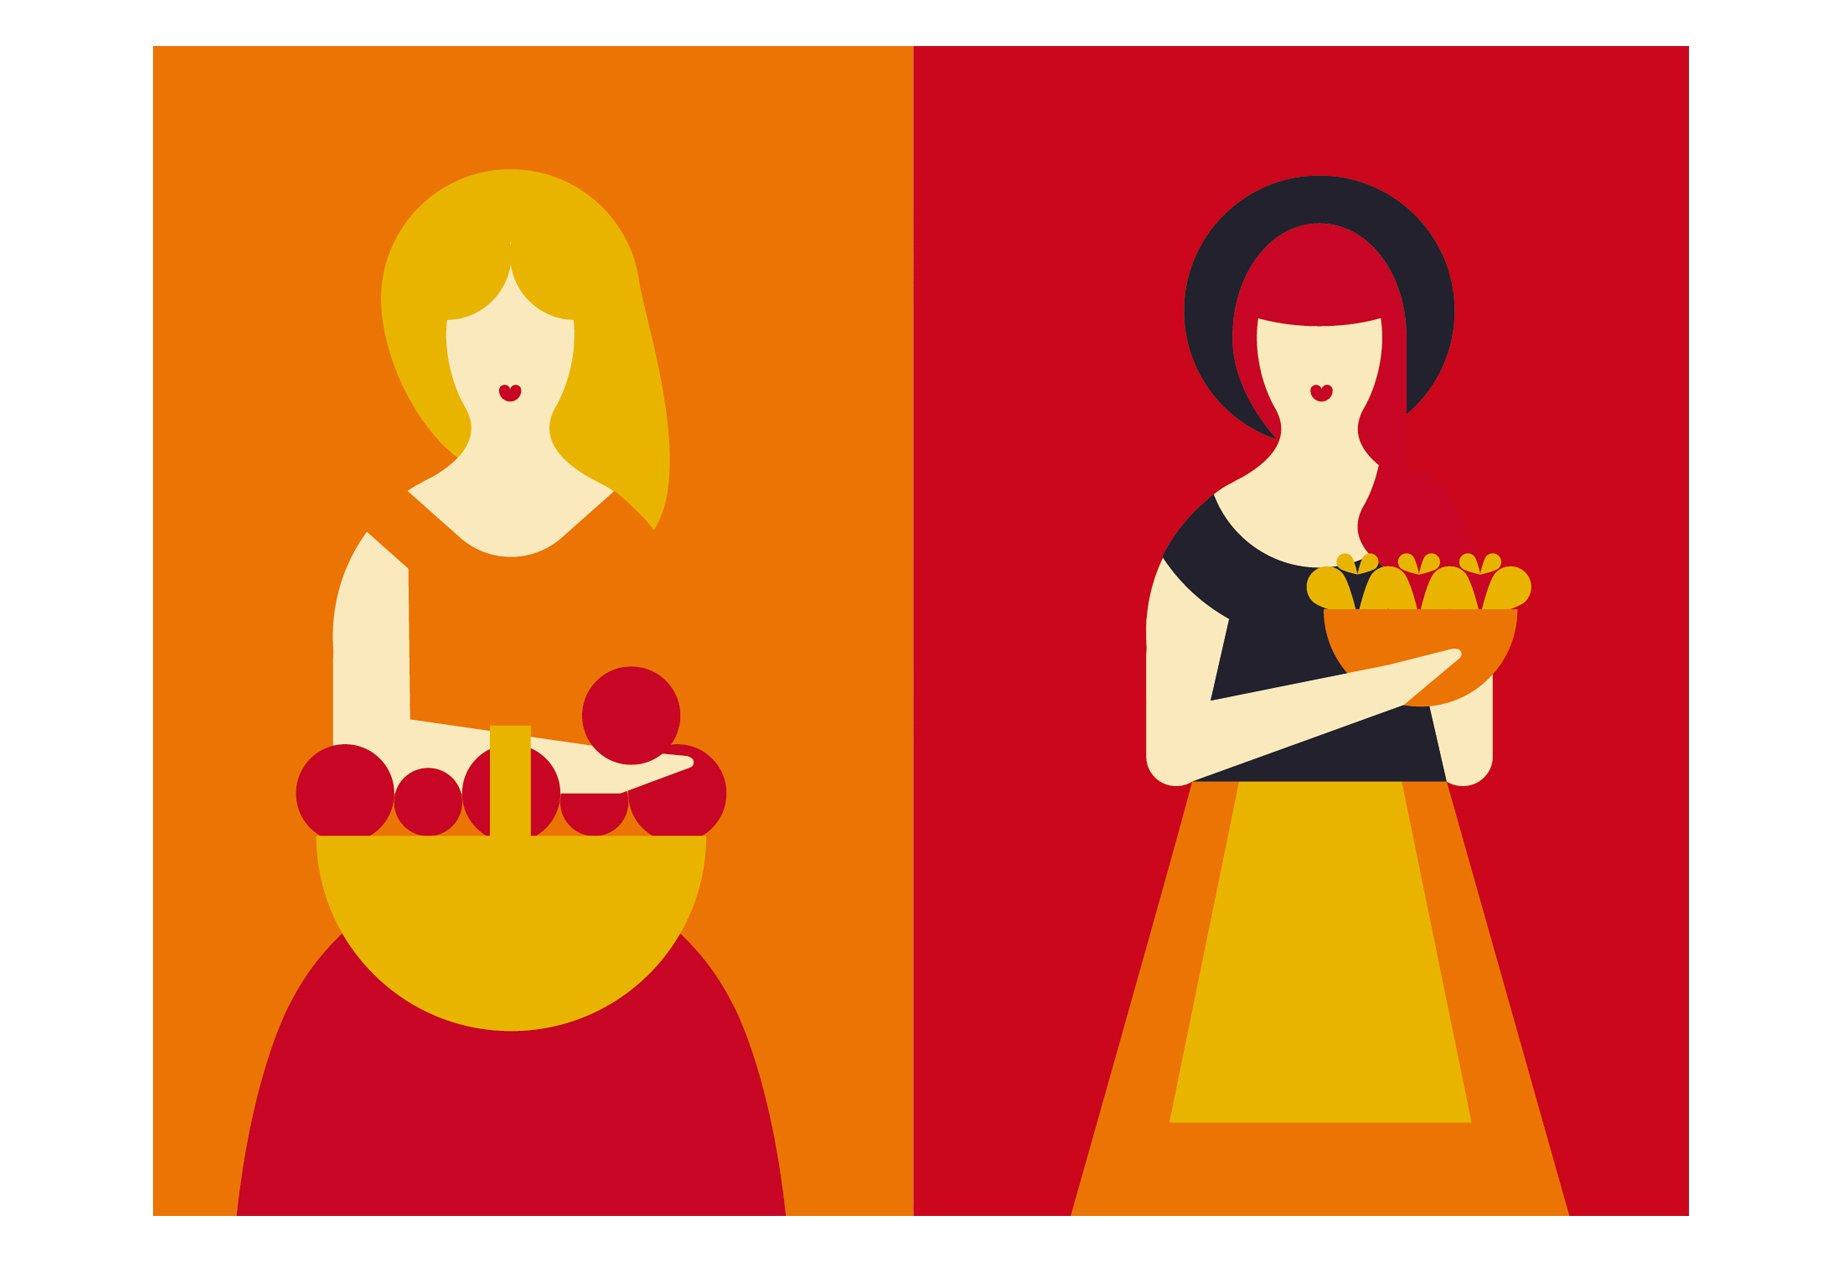 girls-illustration-01-alice-iuri